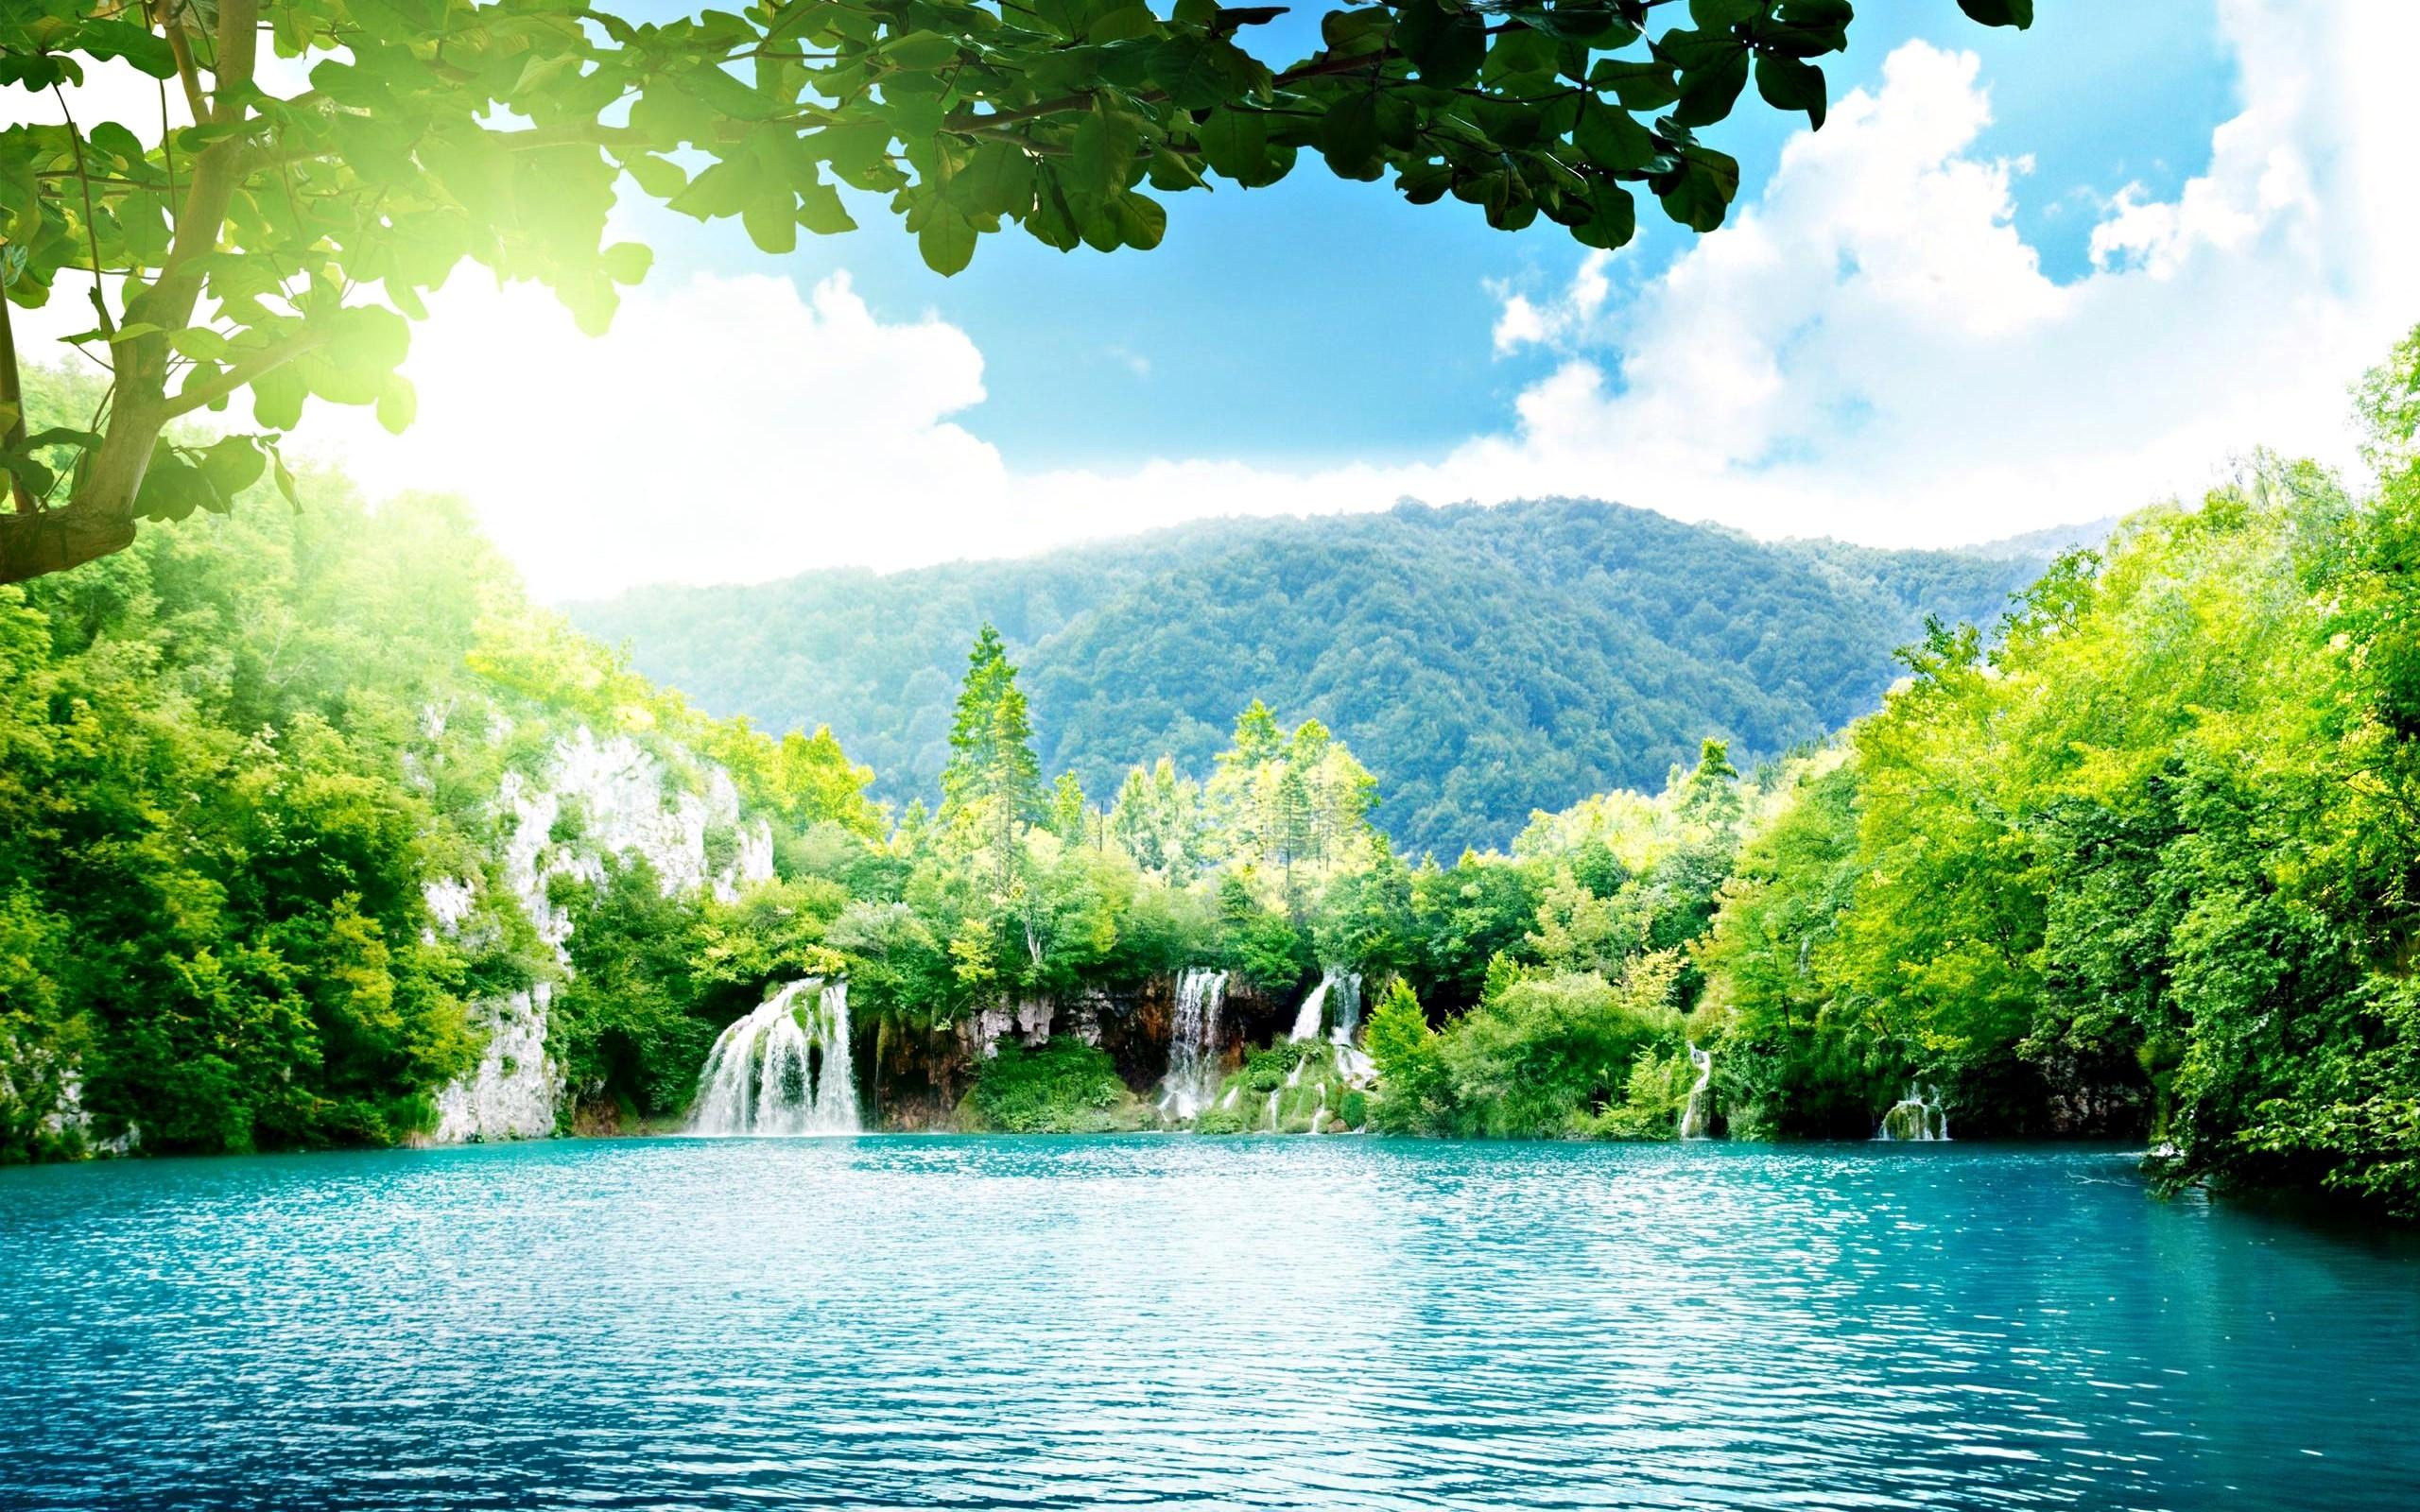 The most beautiful landscape of the wood HD Desktop Wallpaper